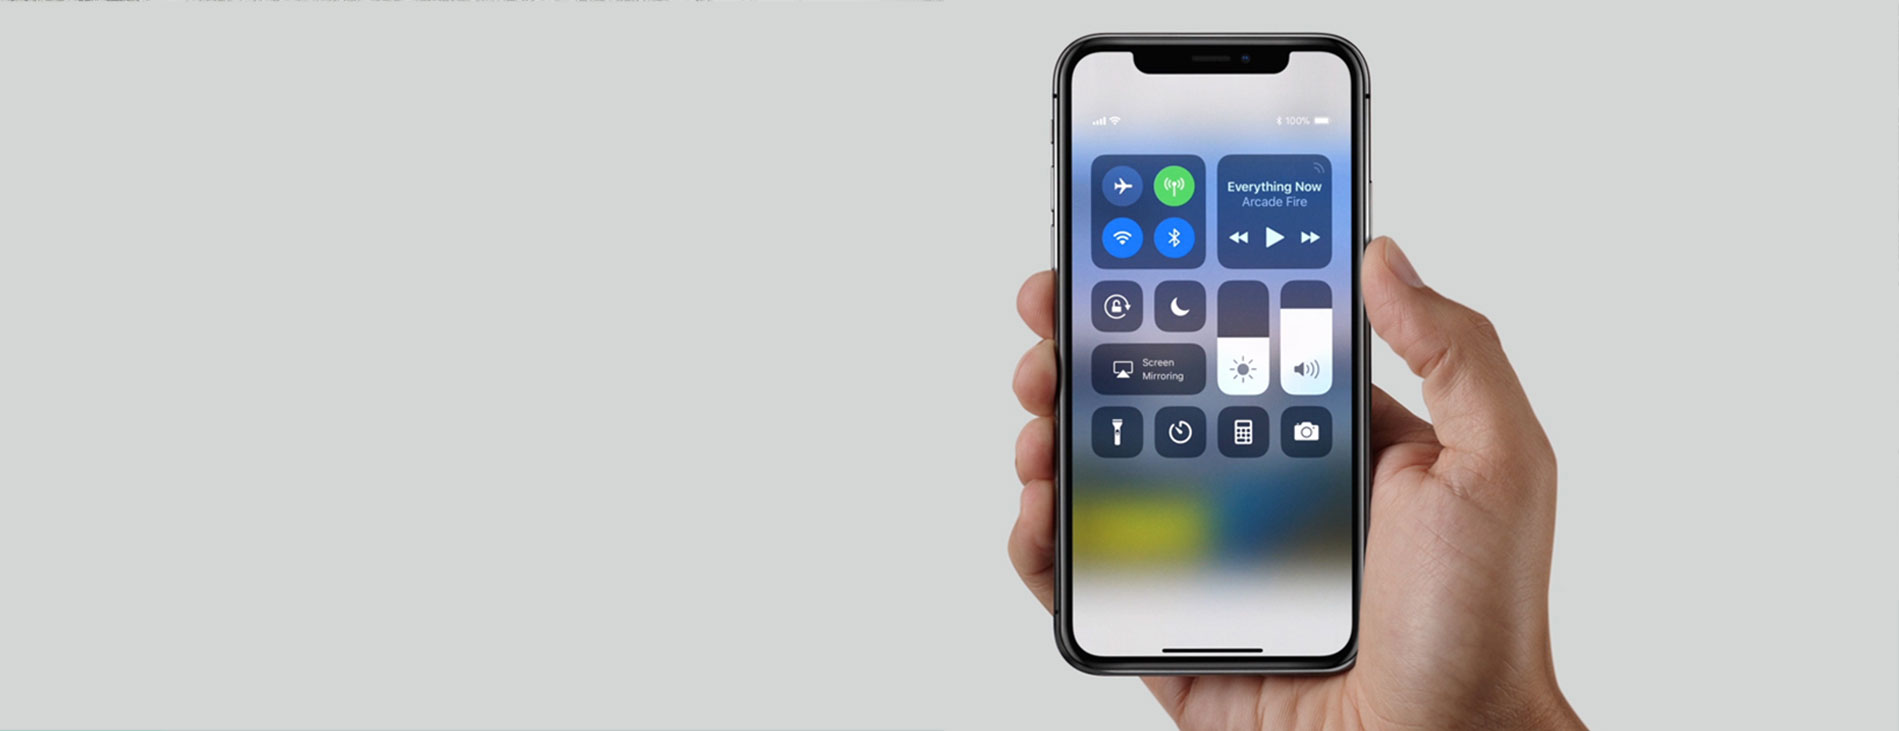 új okostelefon: Apple iPhone X